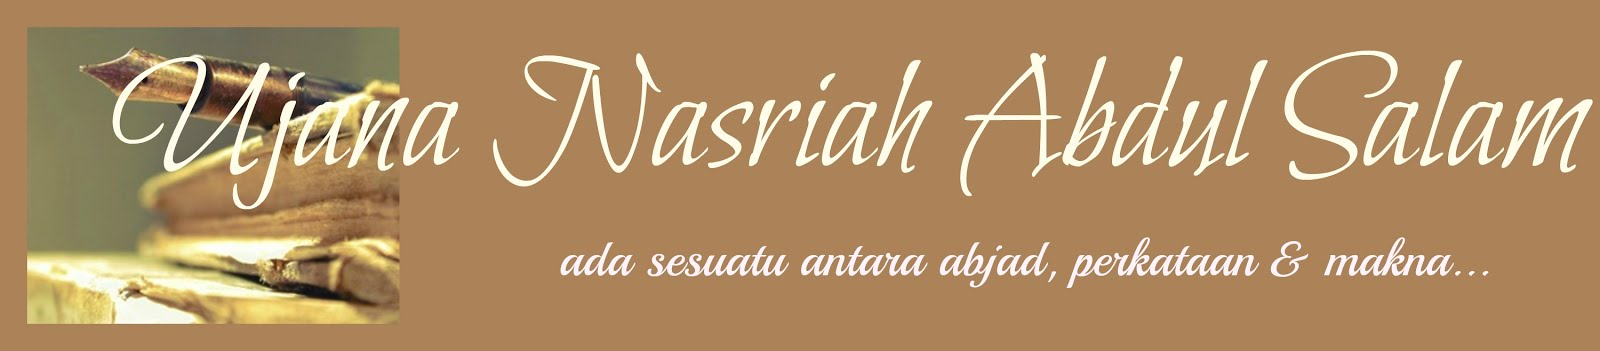 UJANA NASRIAH ABDUL SALAM